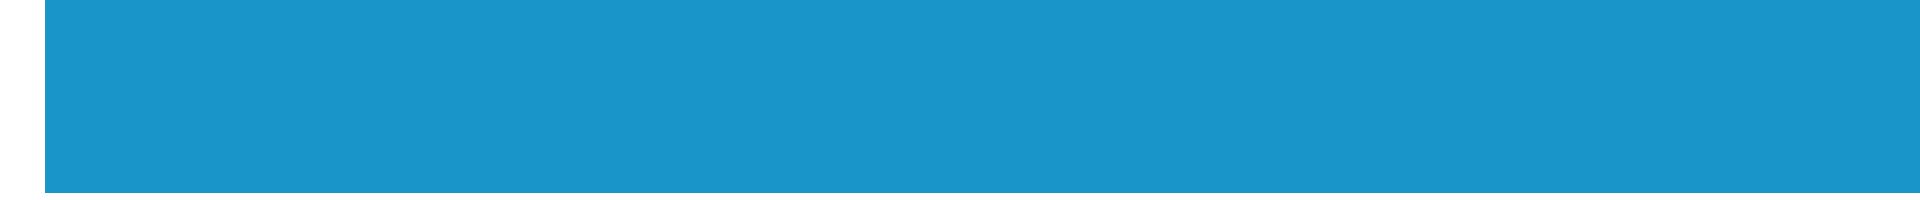 select-adult-senefa-inferior-blue